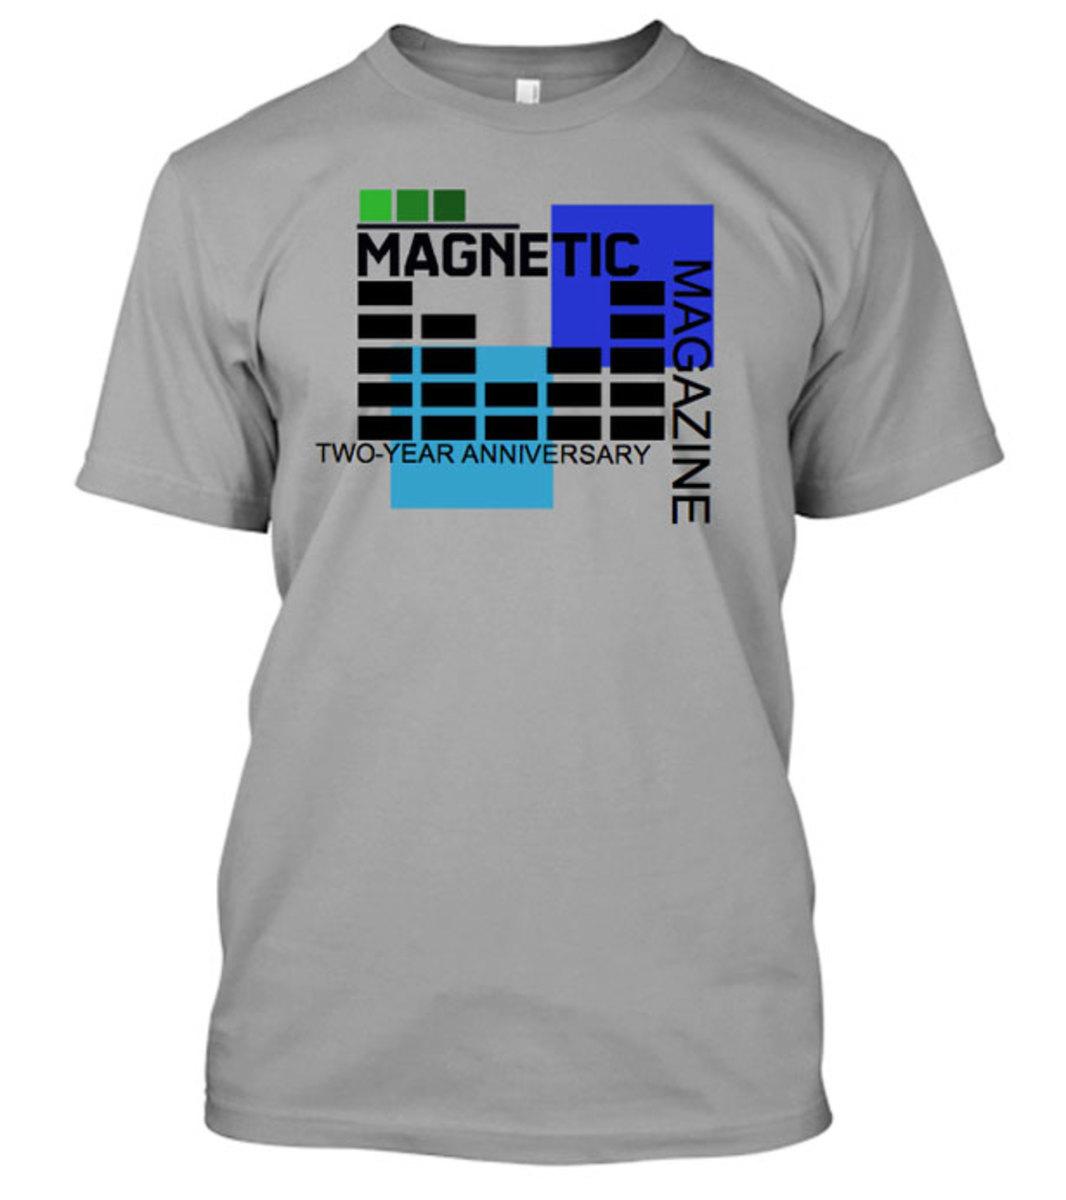 Shirt design contest - Edm News Magnetic T Shirt Design Contest Featured Design